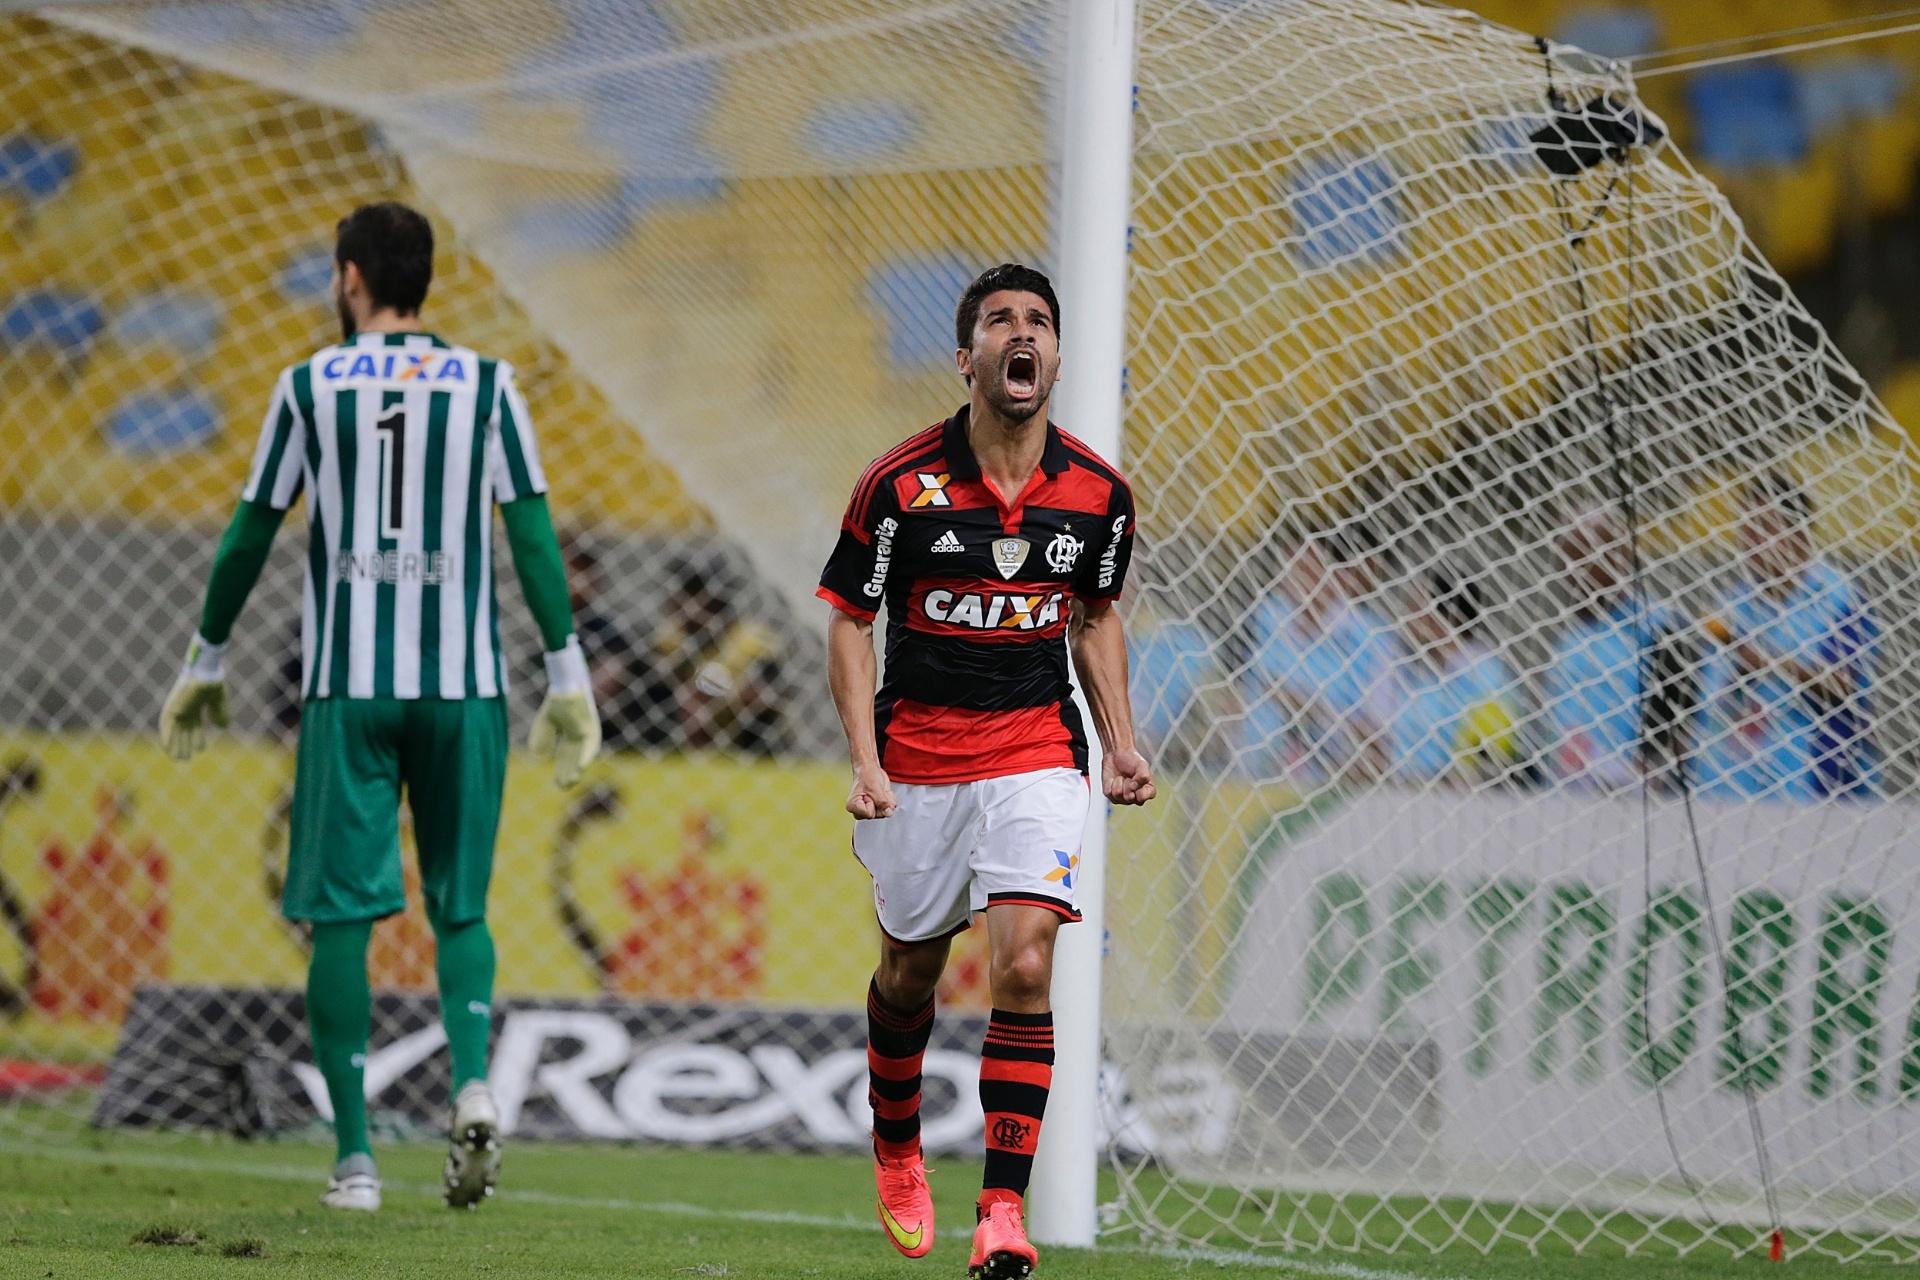 6a28532f75 Fuga da guerra e racismo na Europa. O  croata  do Flamengo abre o jogo -  23 09 2014 - UOL Esporte